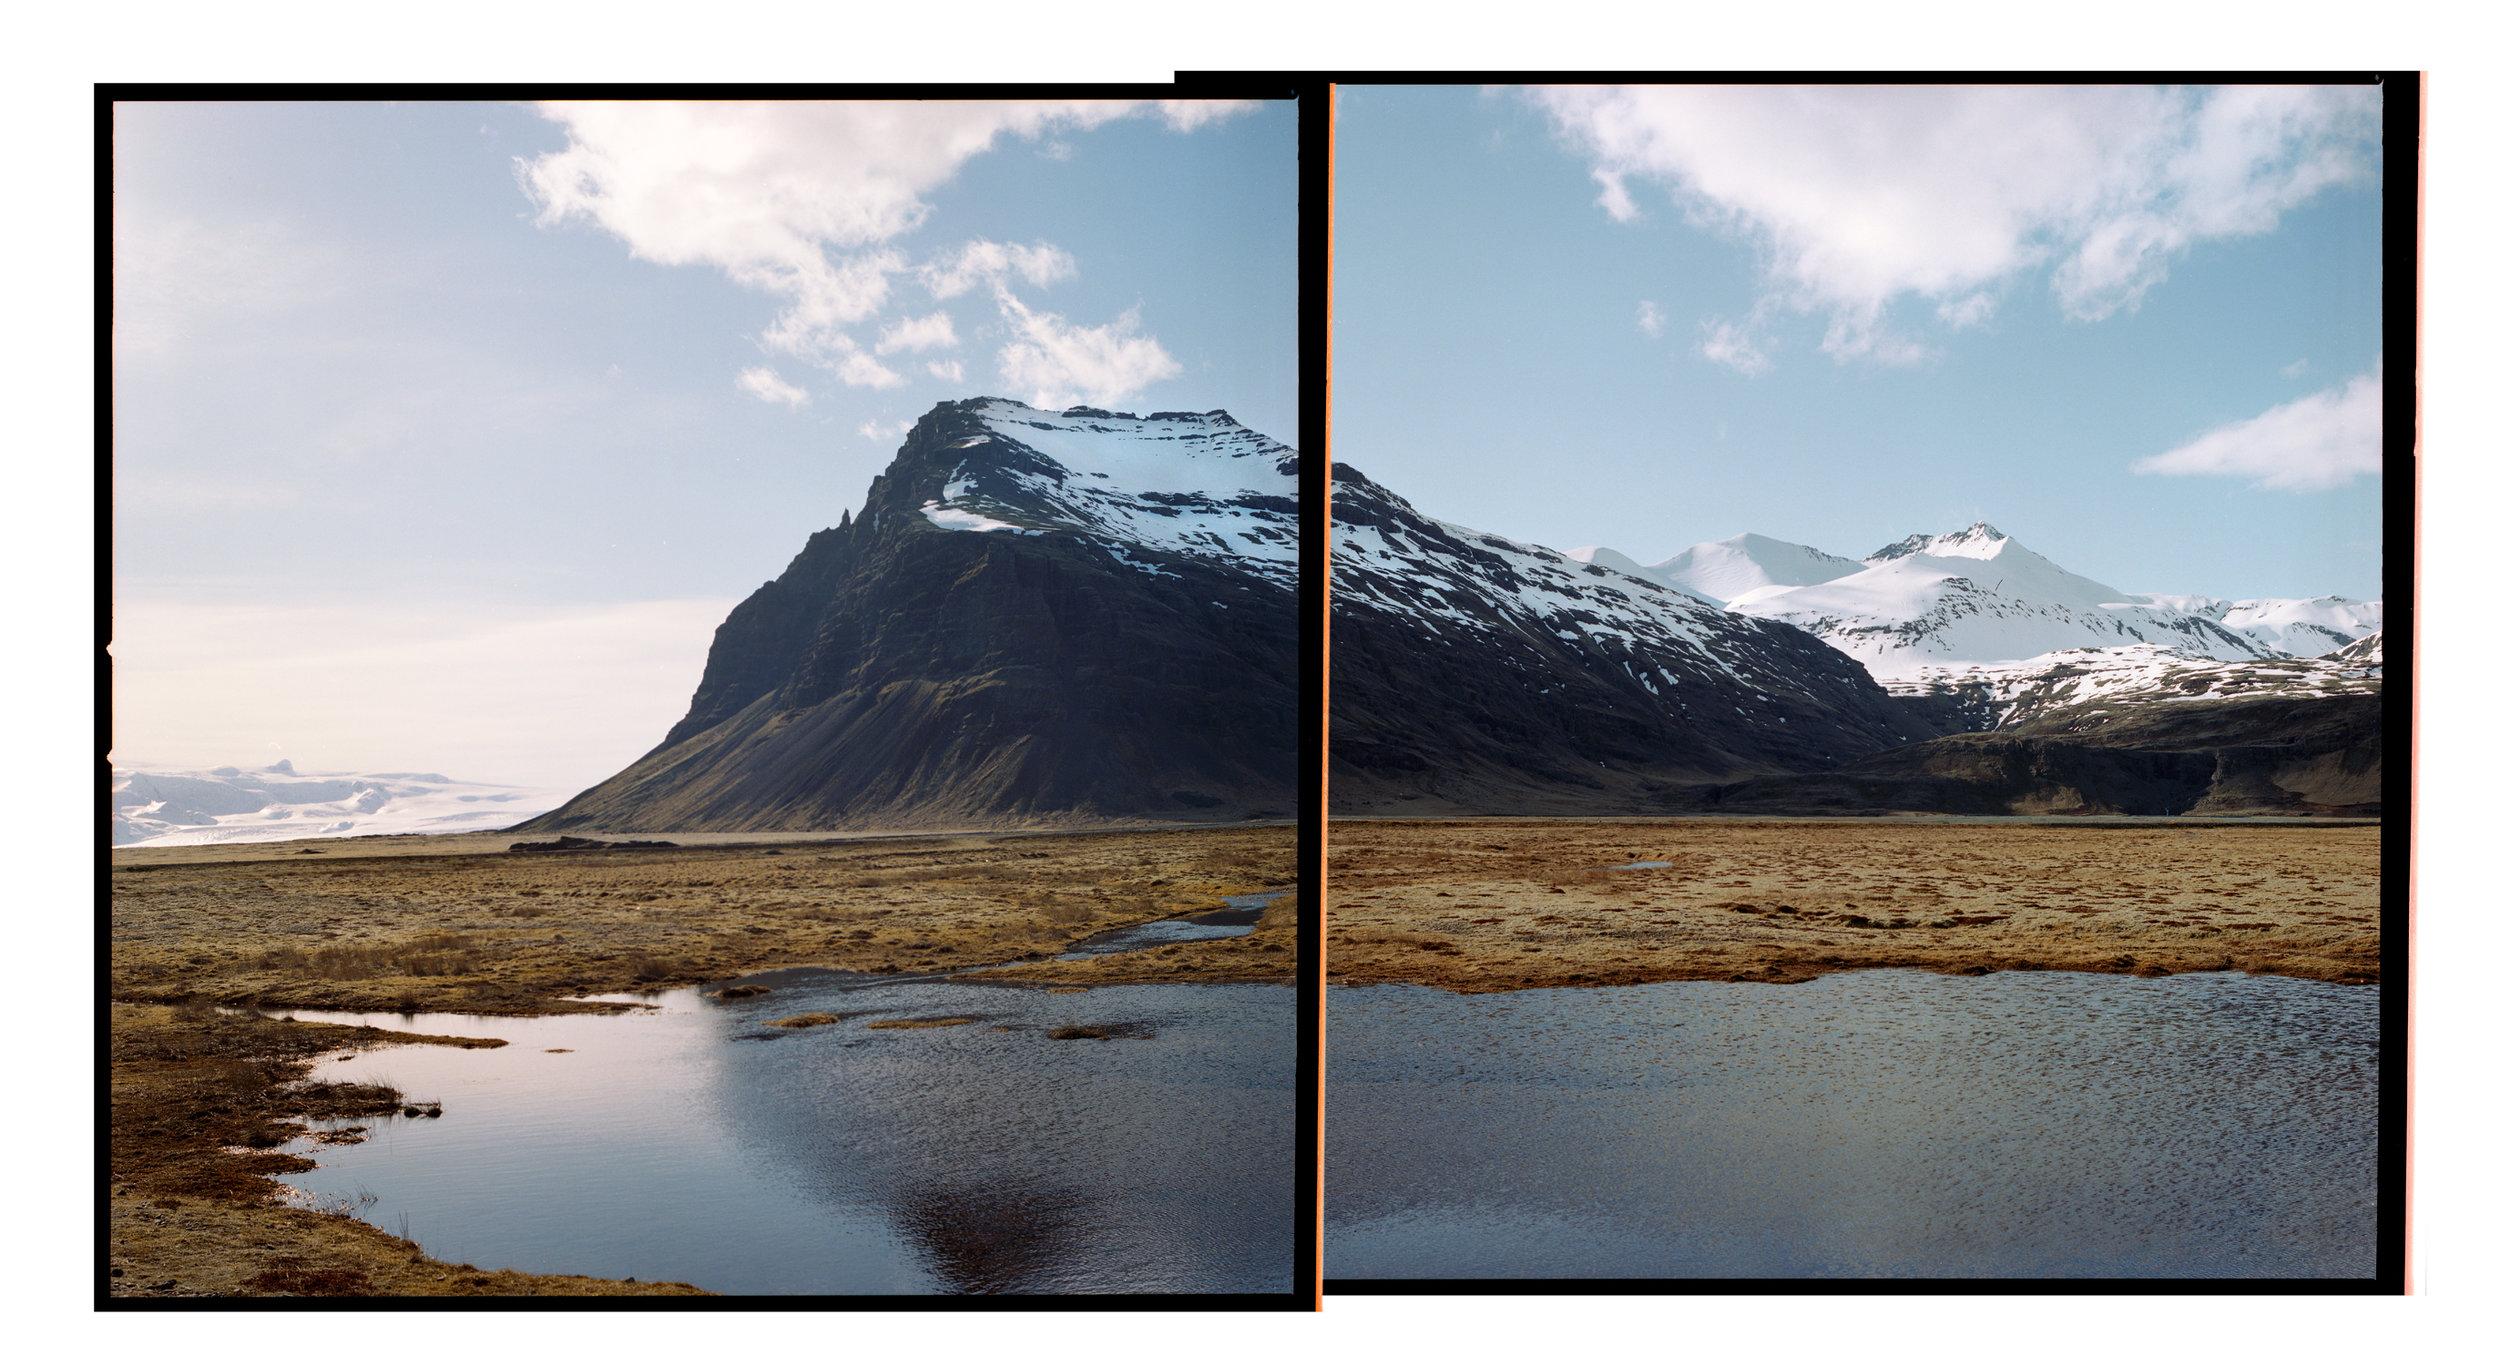 iceland106.jpg